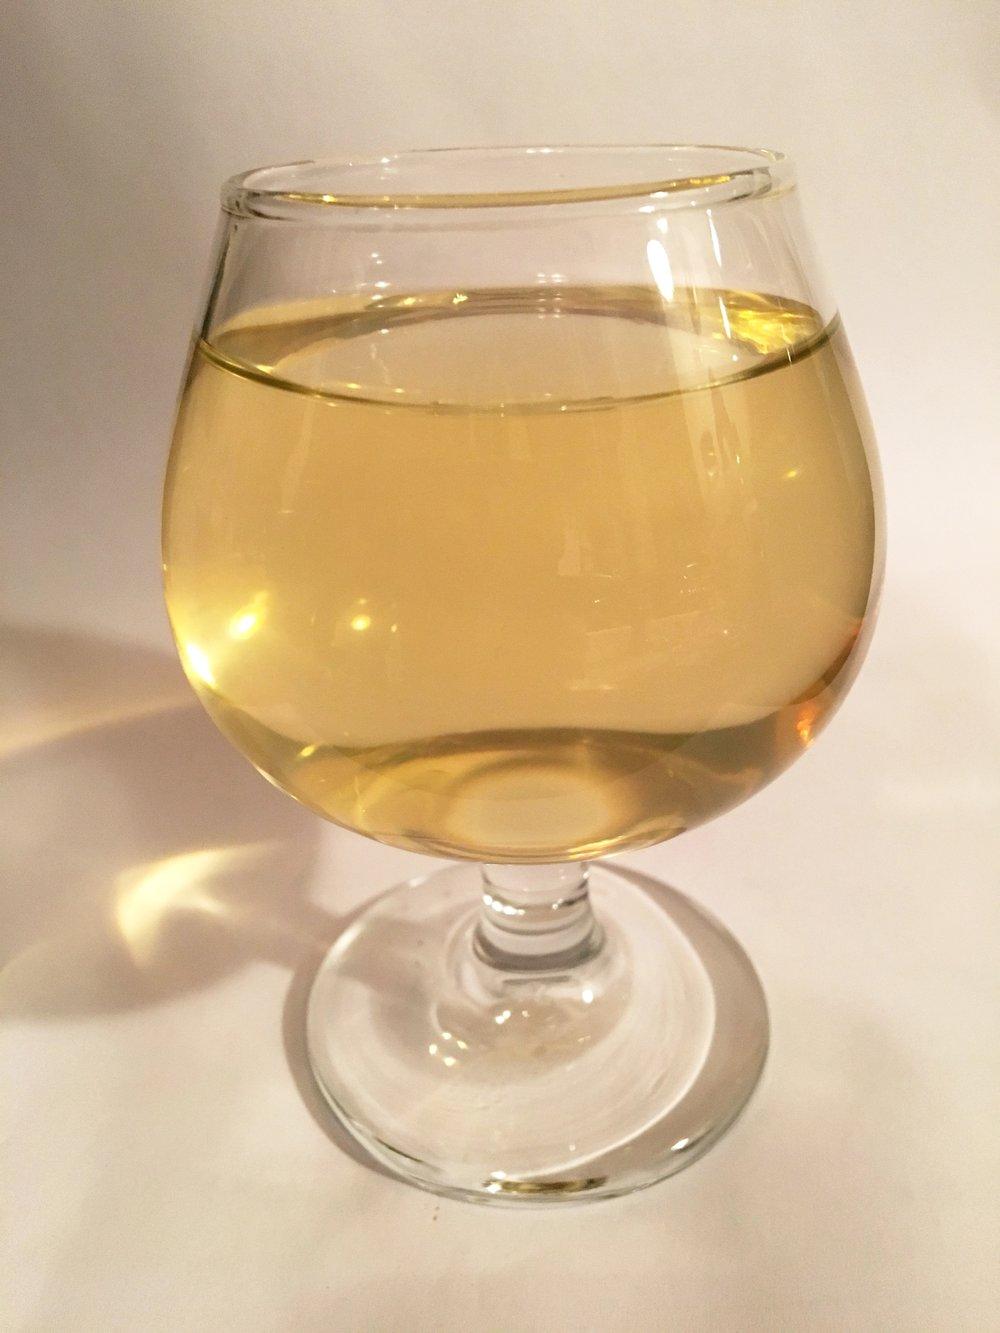 Cortland Cider